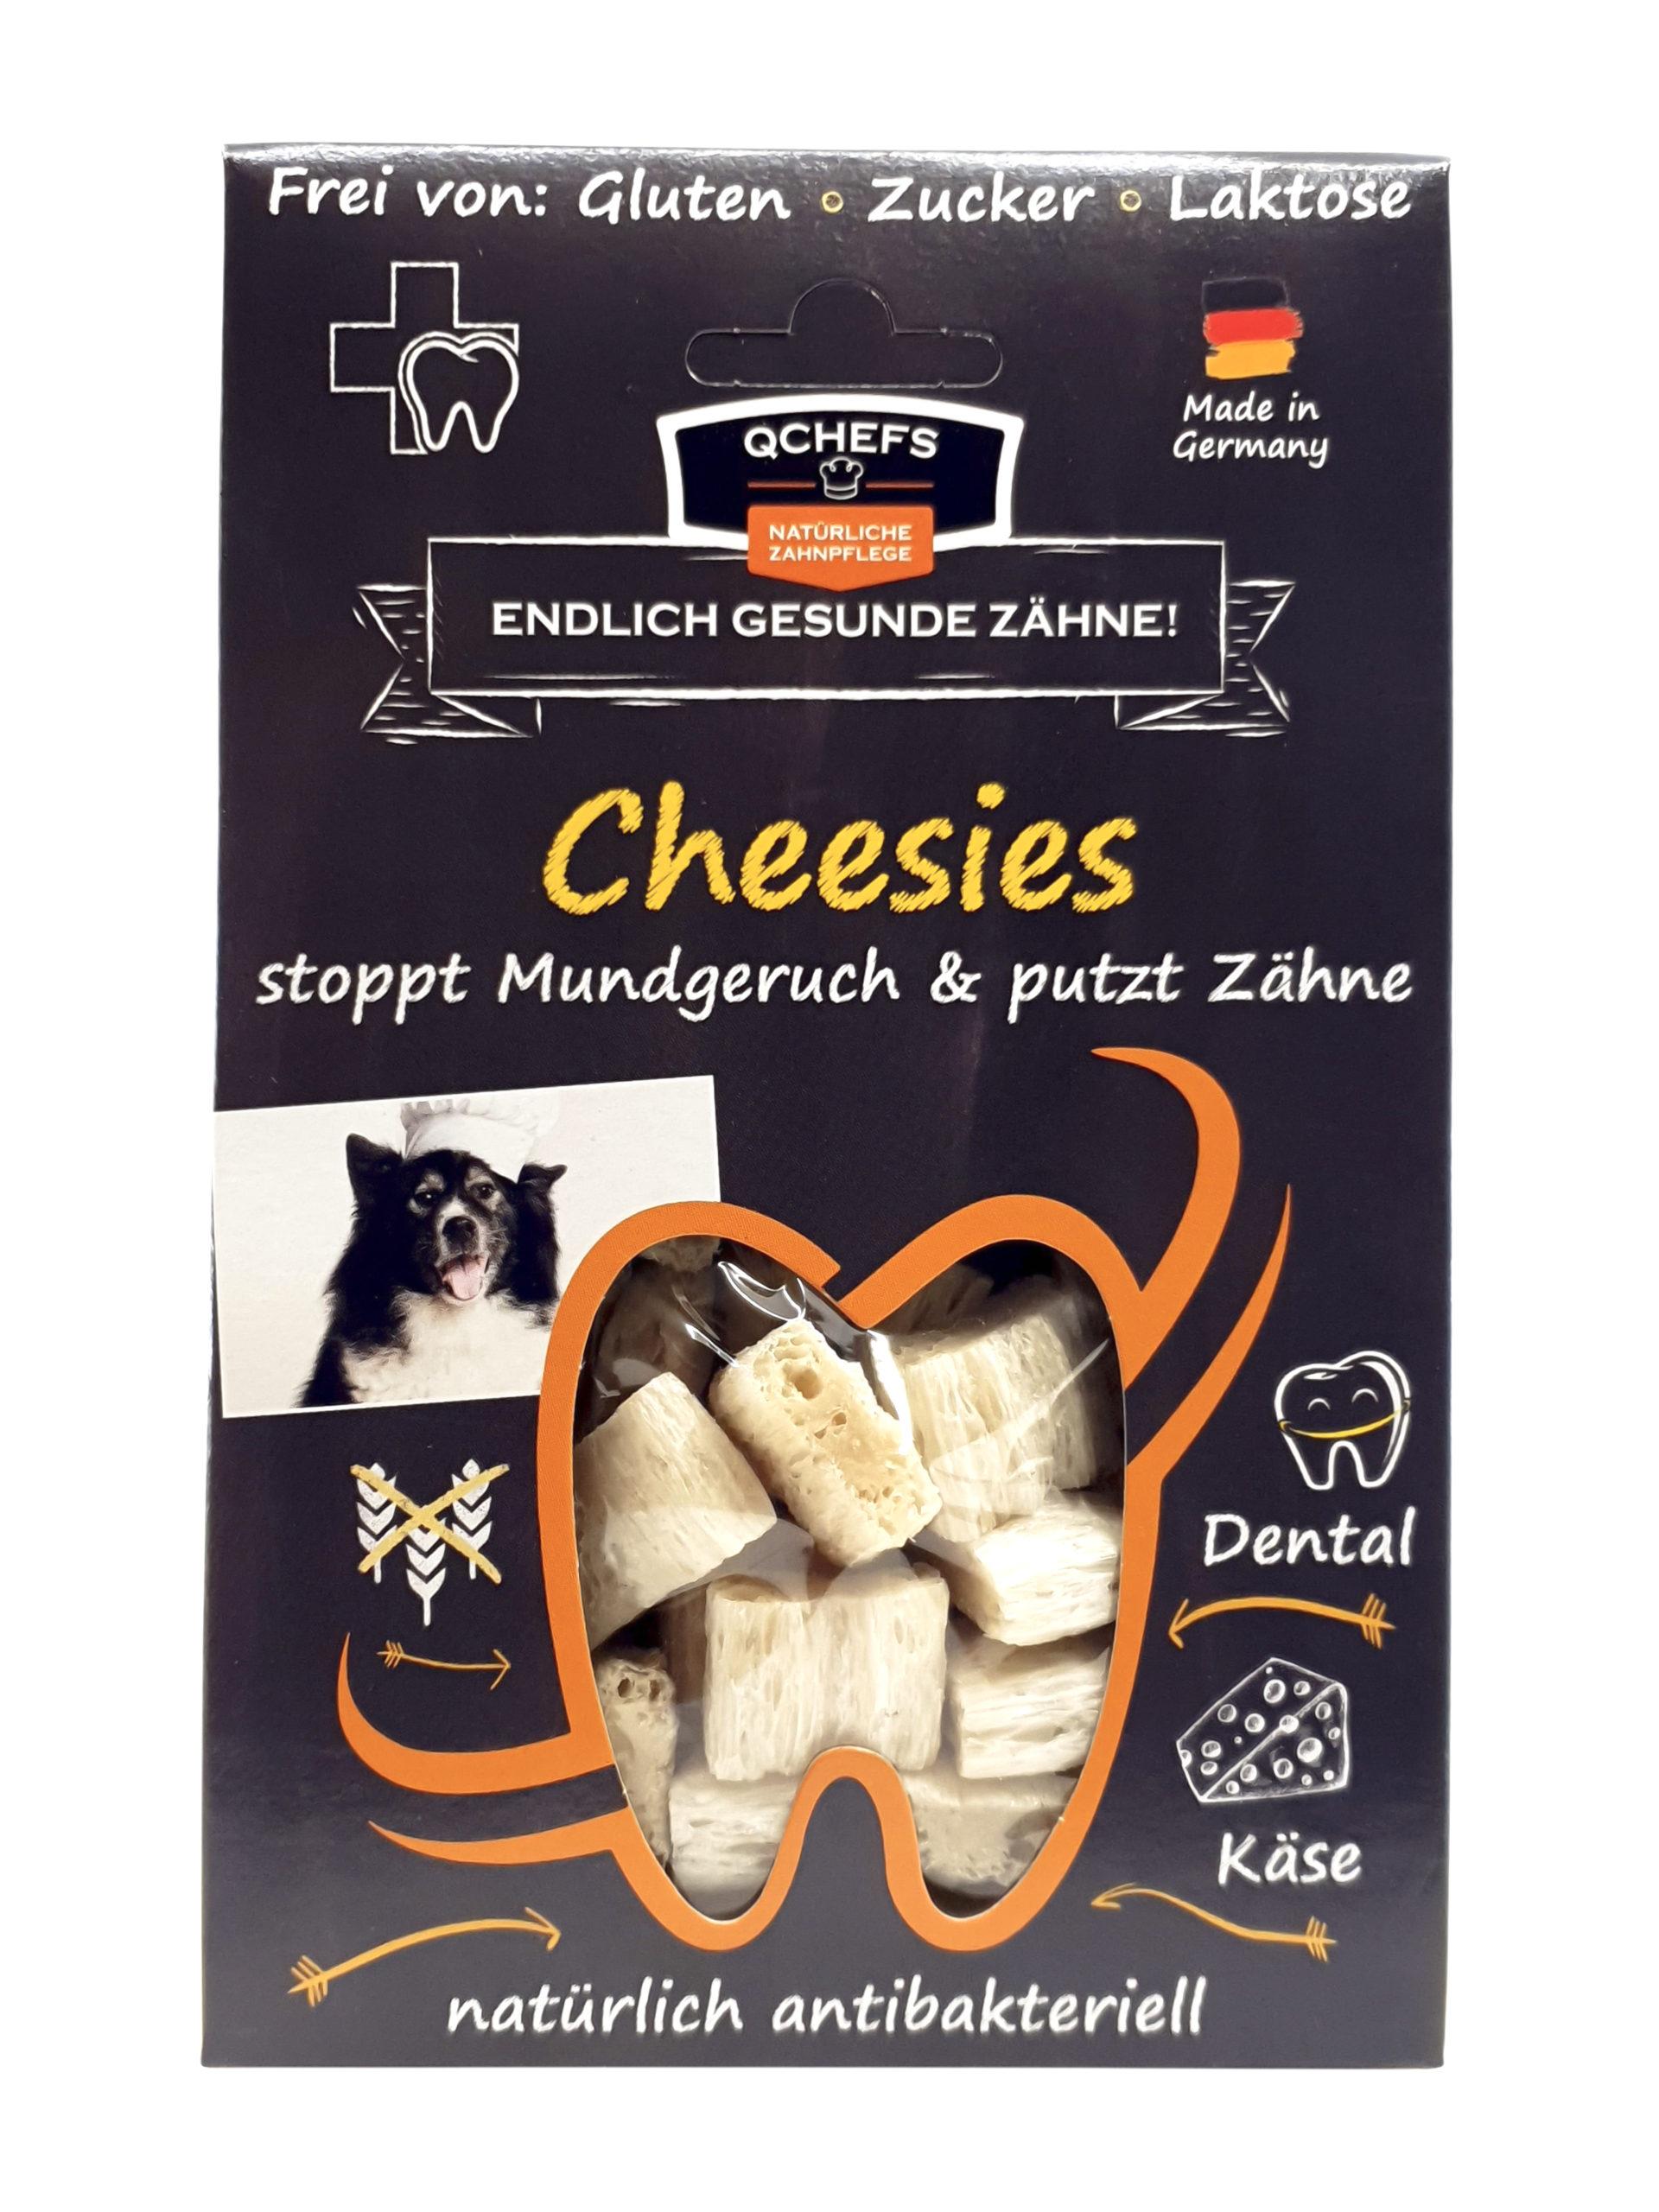 Qchefs Cheesies Zahnpflege lecker